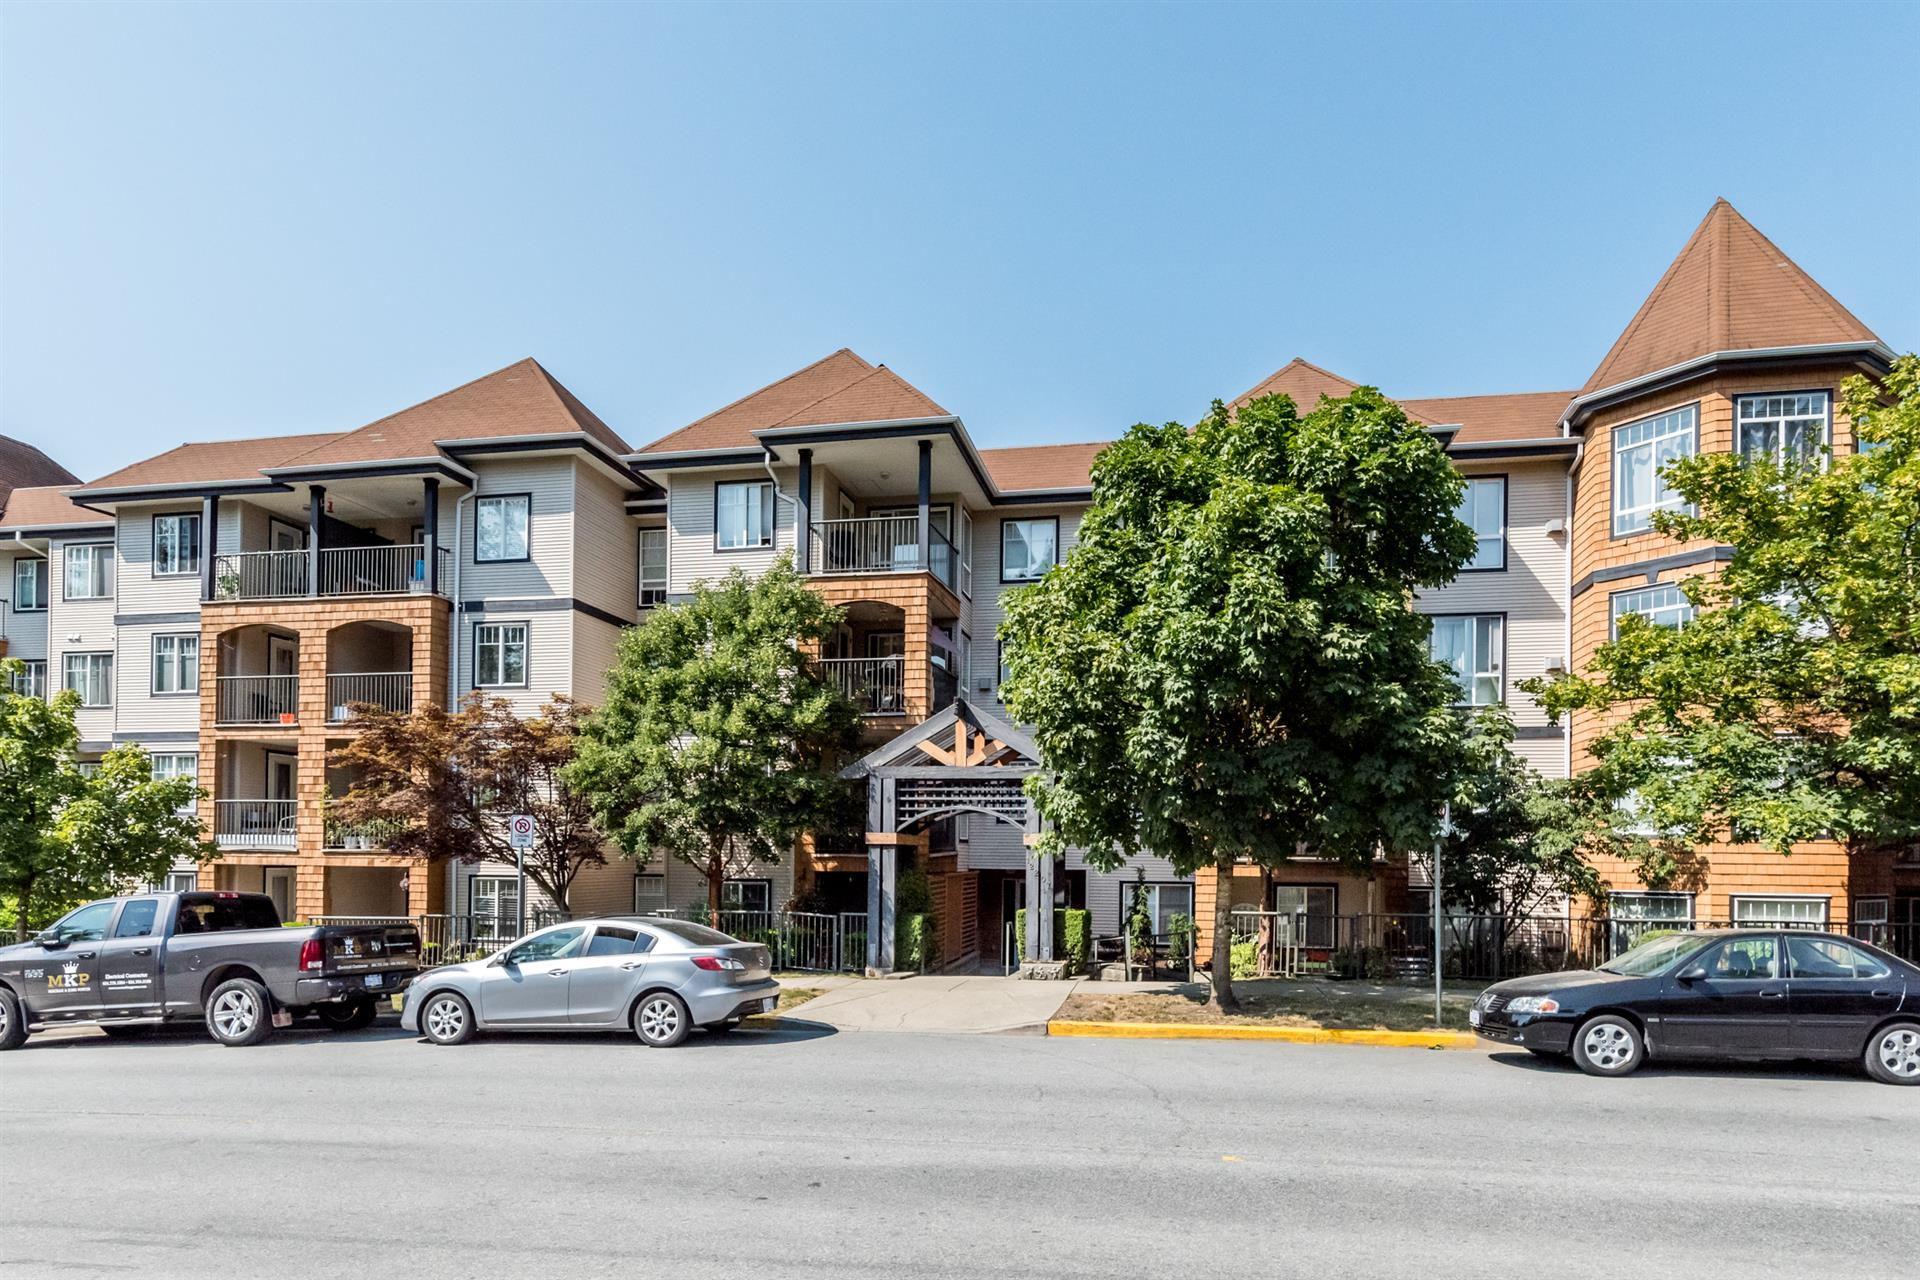 Main Photo: 402-12207 224TH in Maple Ridge: West Central Condo for sale